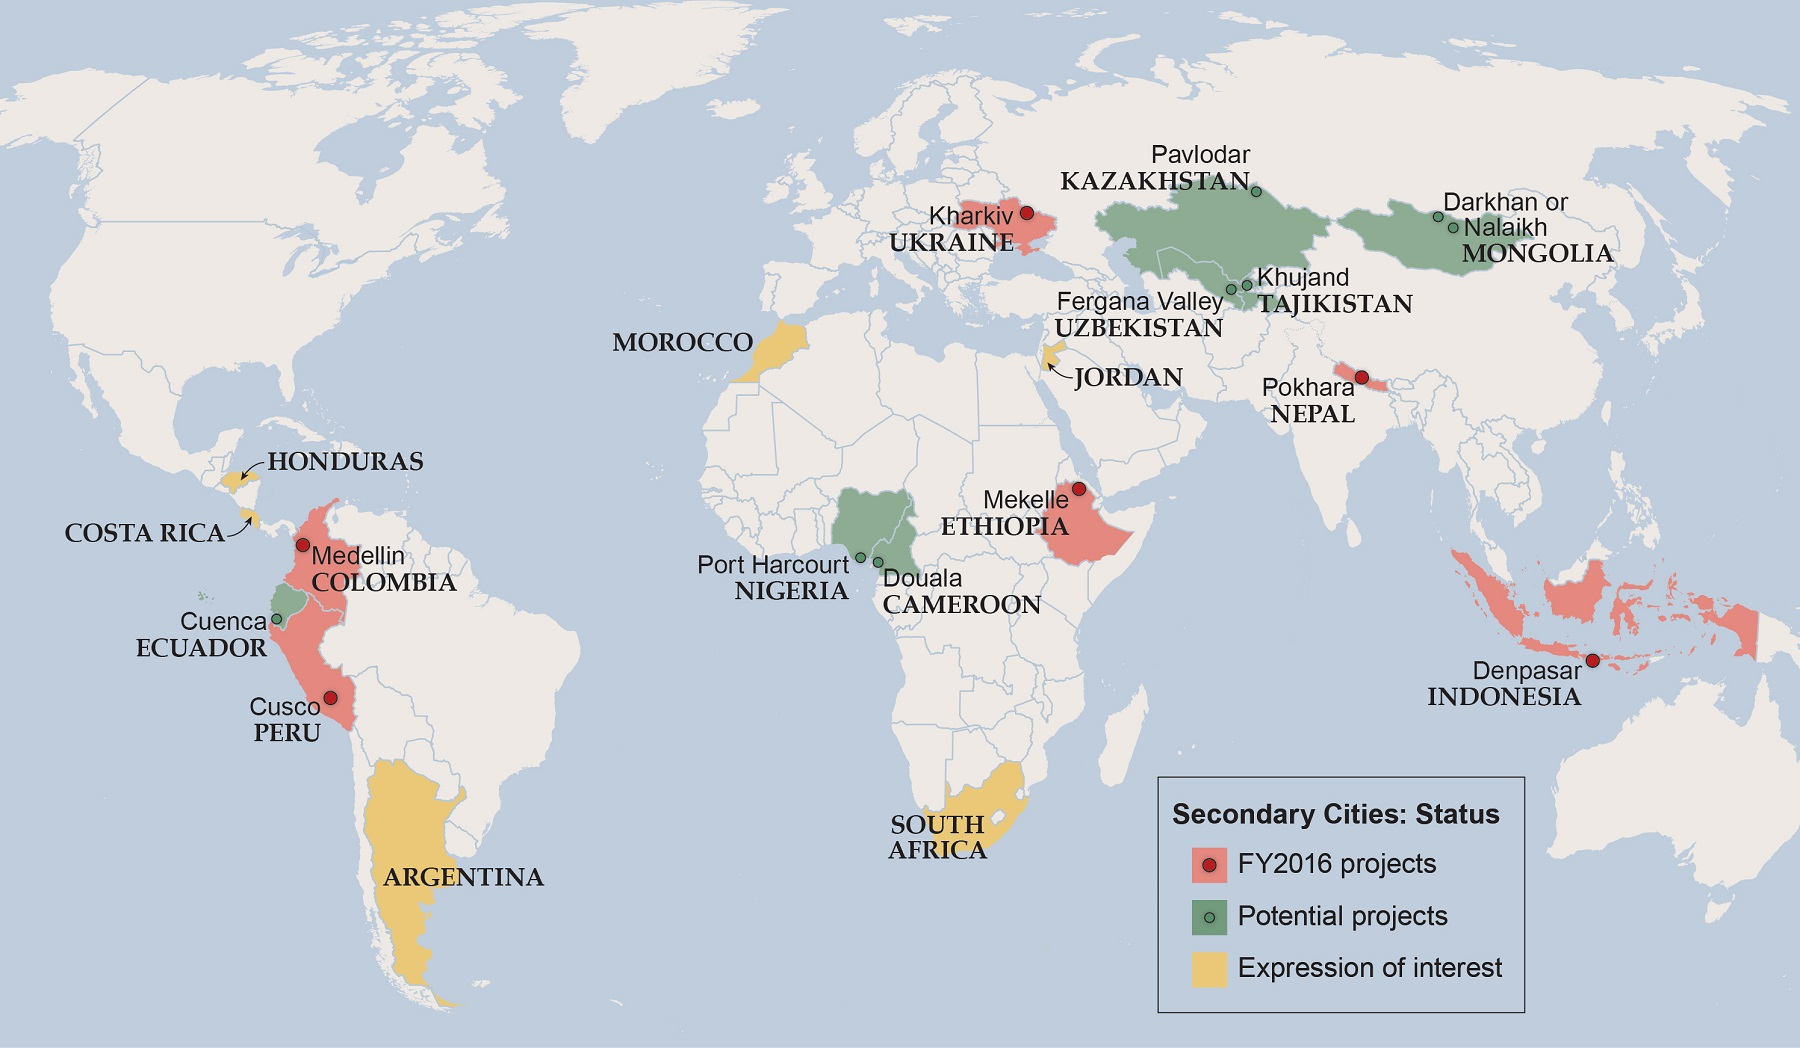 Secondary Cities - Peru major cities map